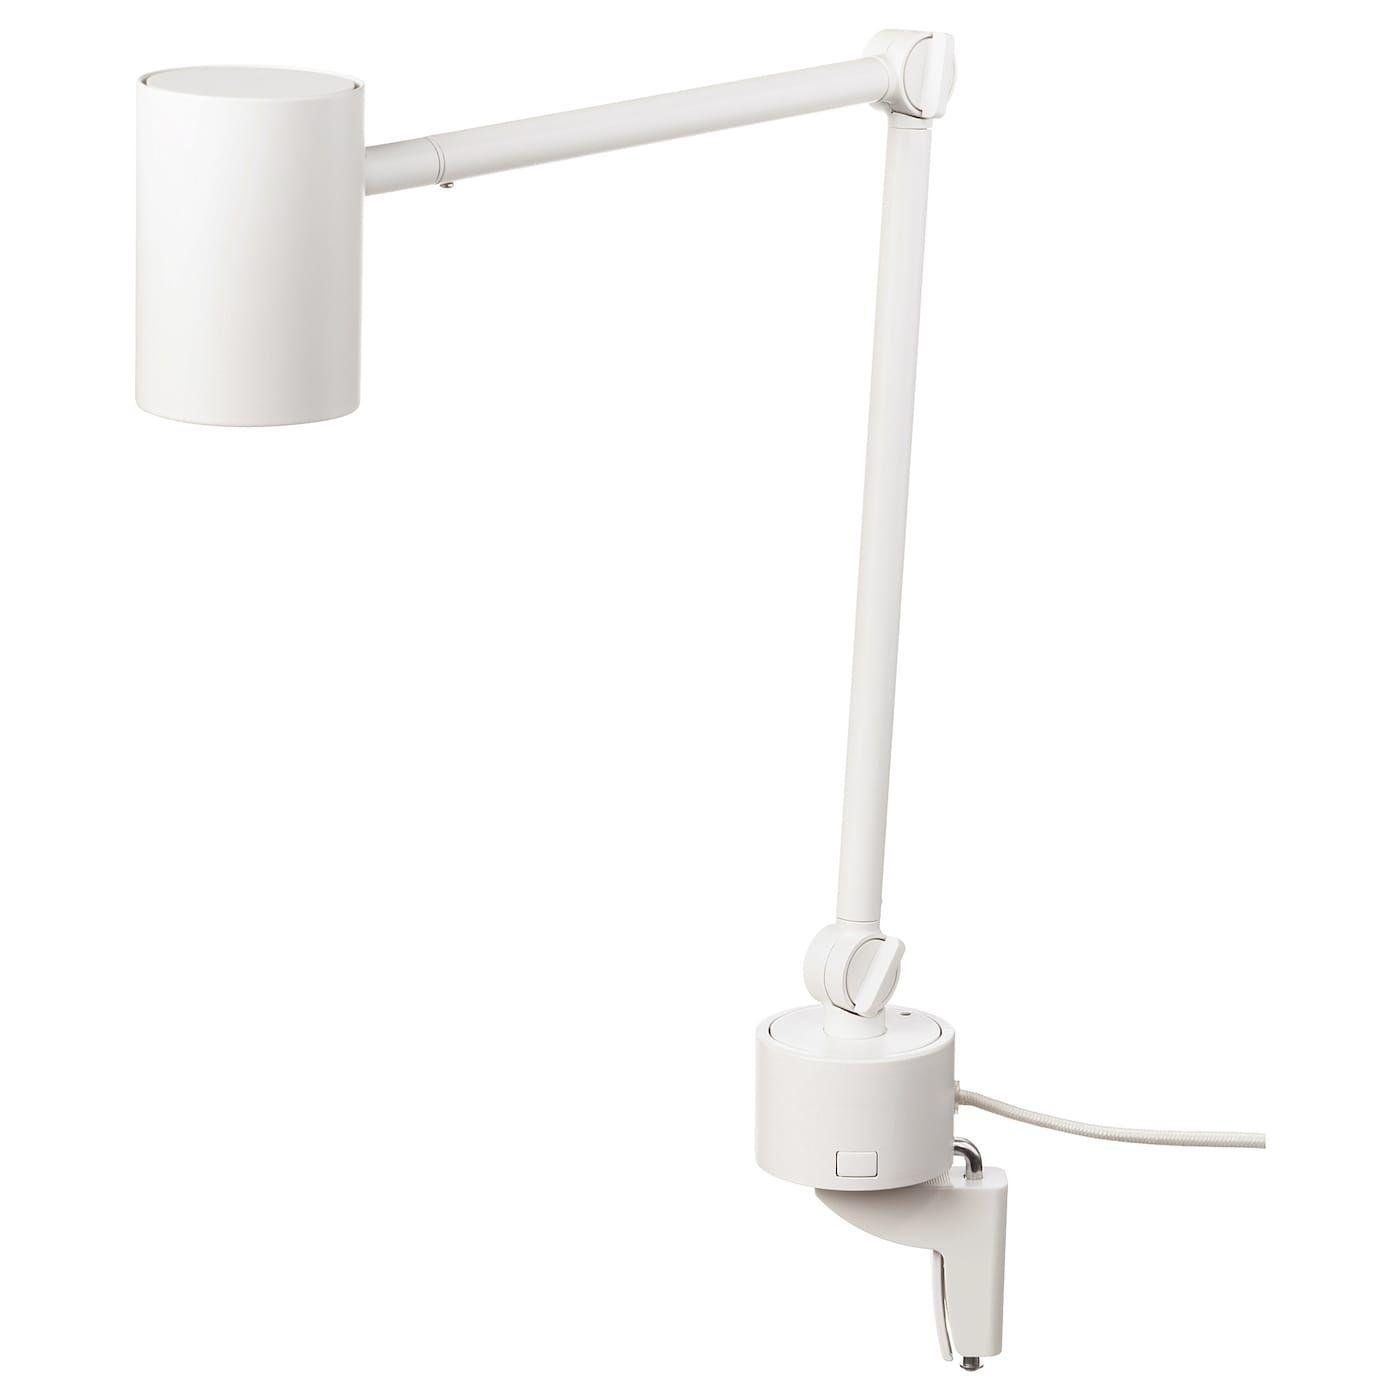 Nymane Arbeits Wandleuchte Weiss Ikea Deutschland Wall Lamp Lamp Work Lamp